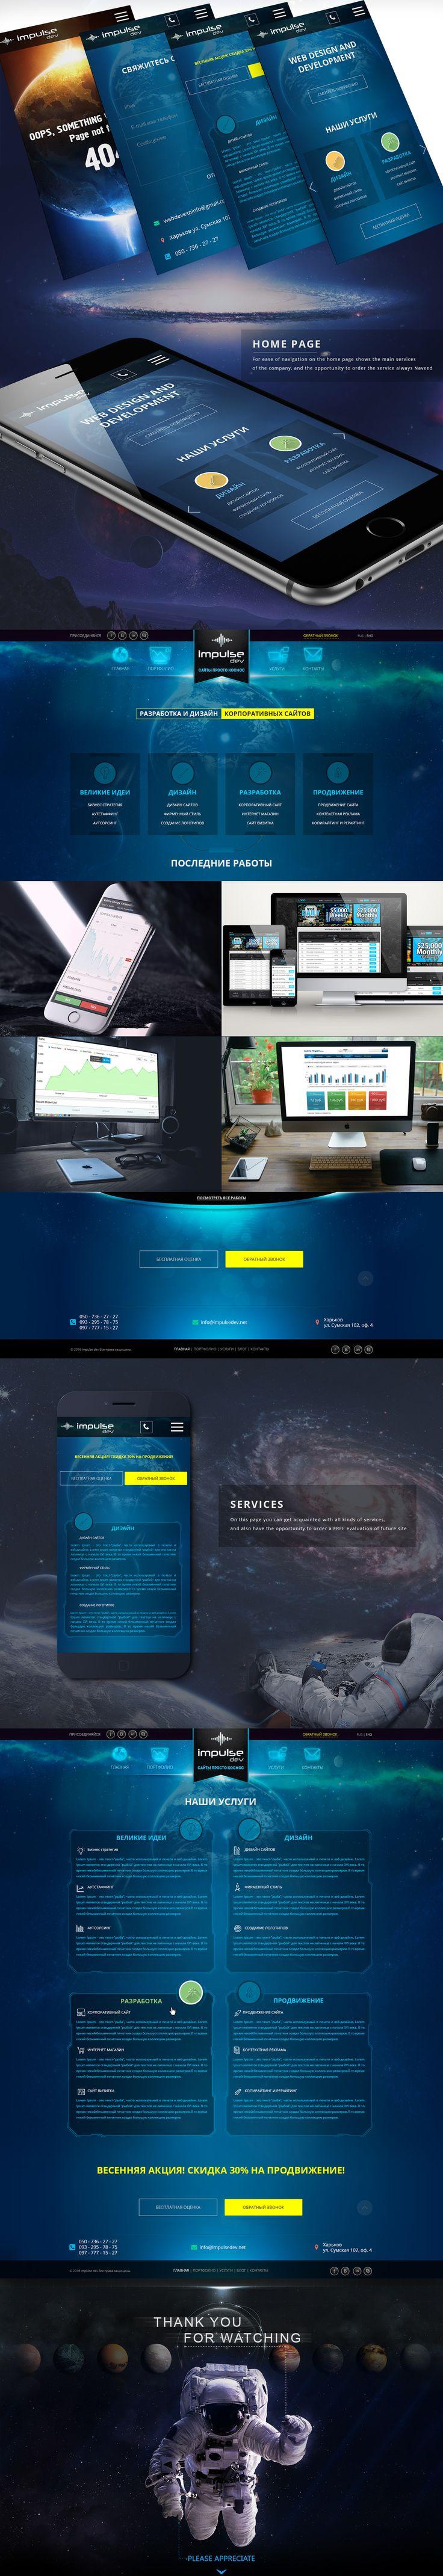 impulse dev - web studio on Behance